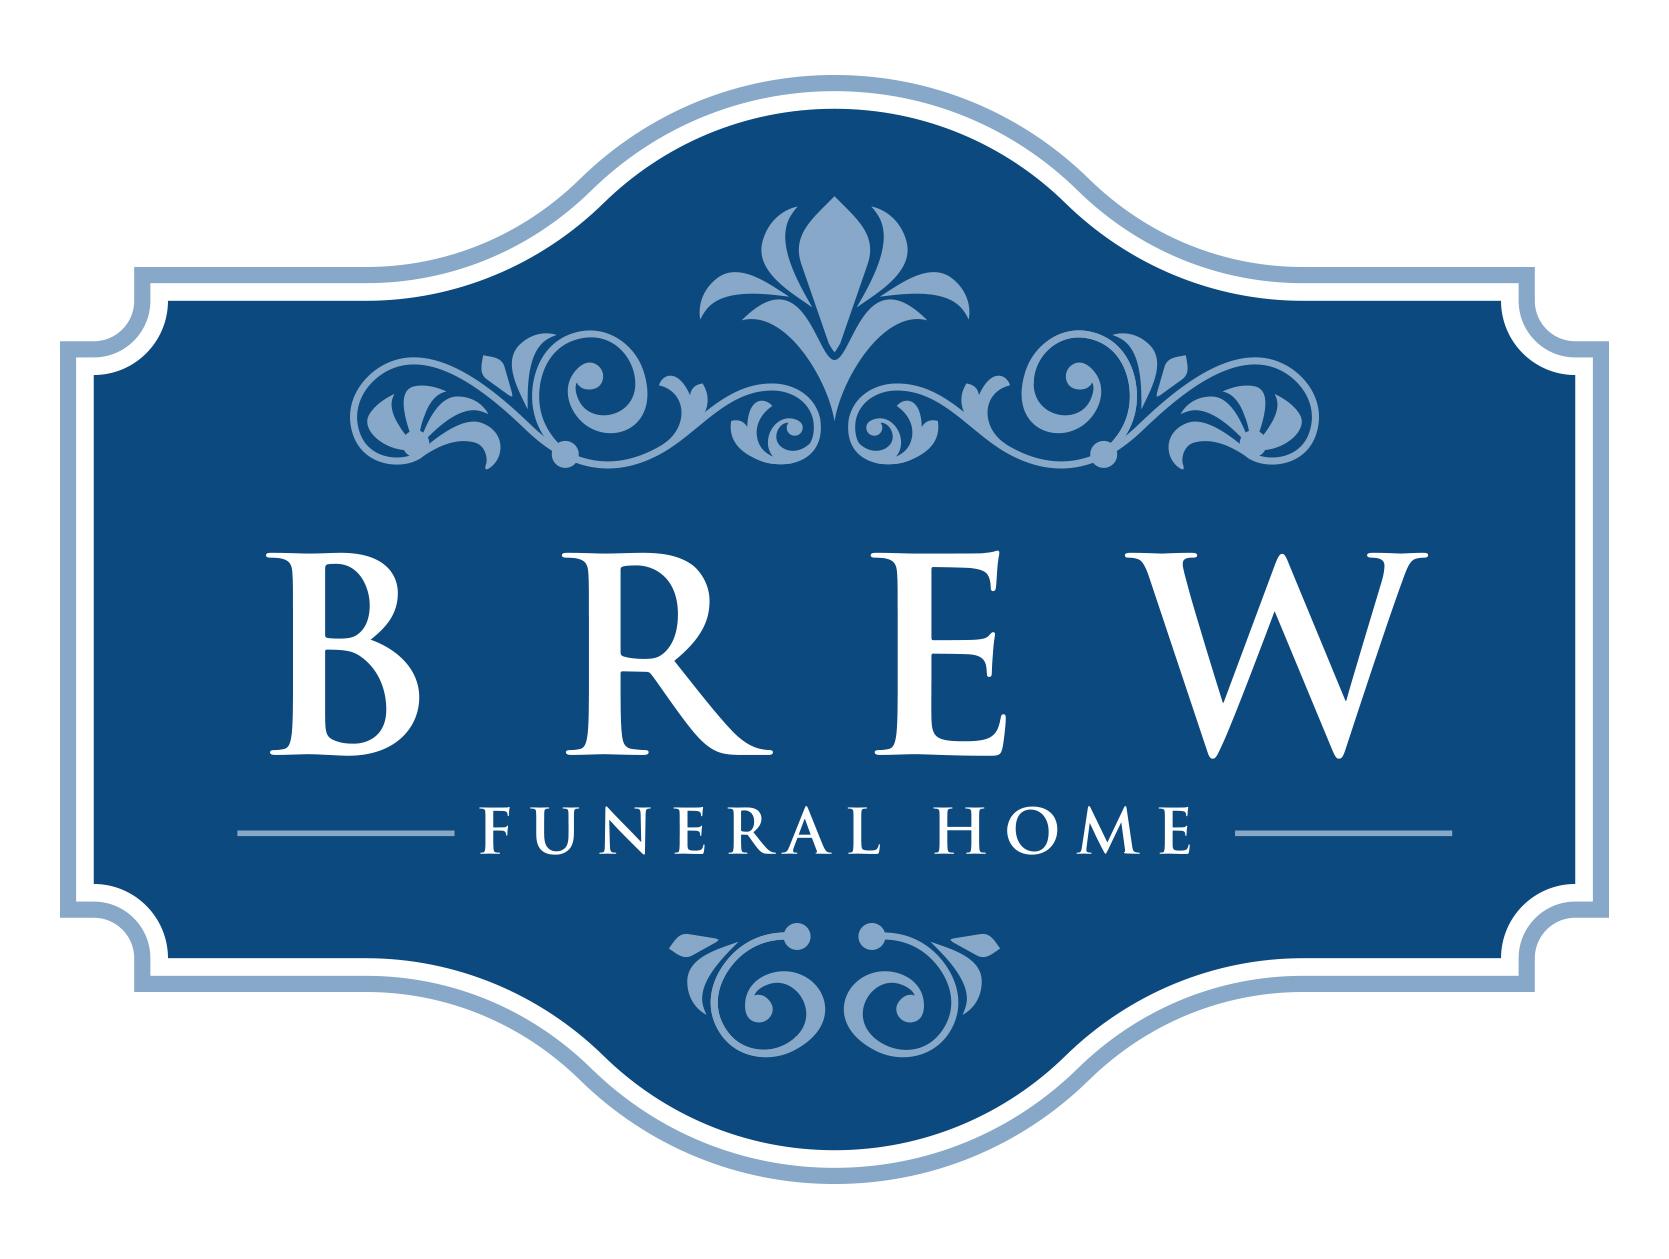 Brew_Funeral_Home_logo_4C.jpg